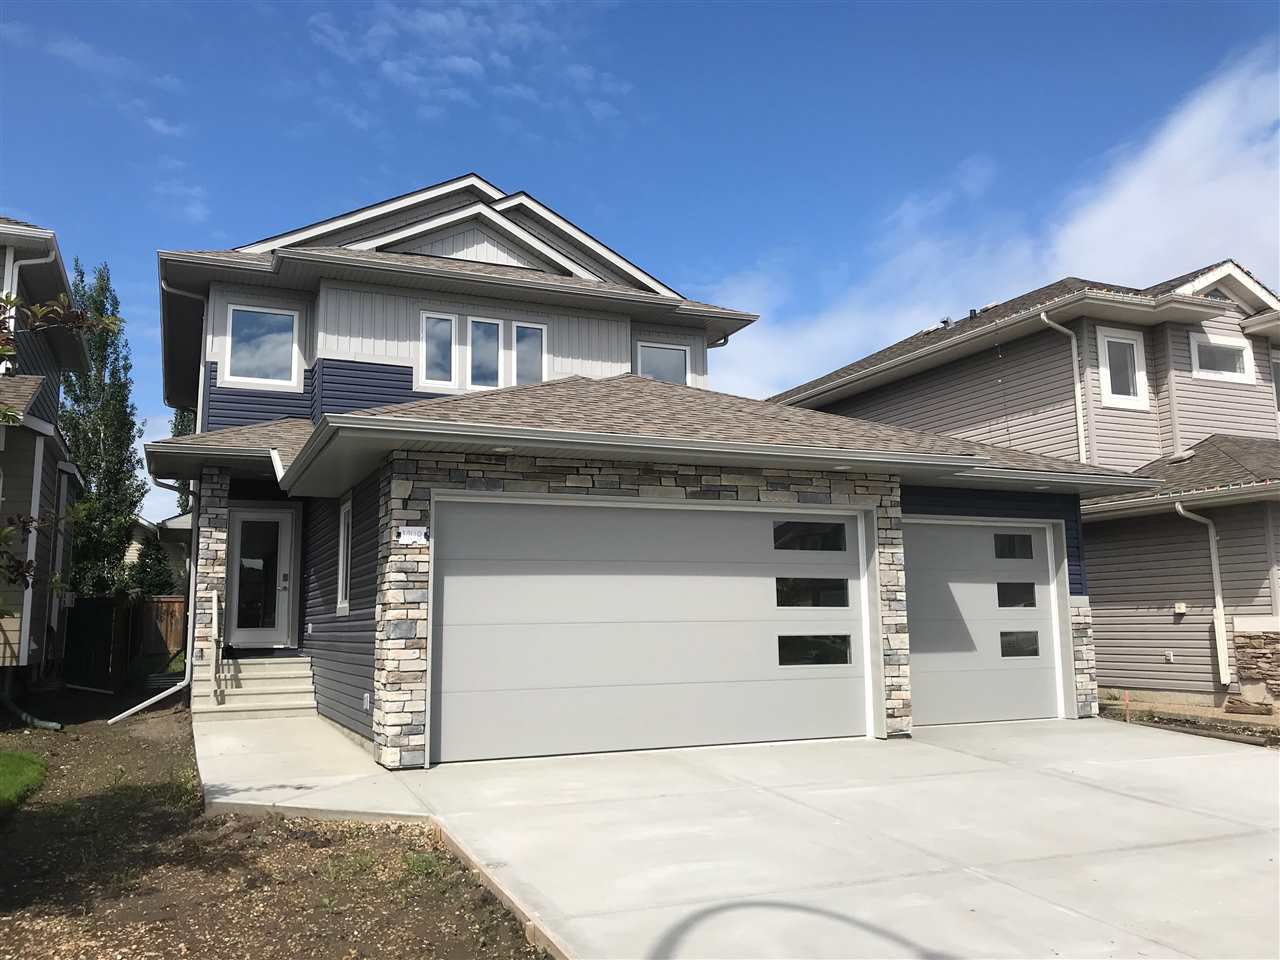 Main Photo: 10118 96 Street: Morinville House for sale : MLS®# E4163857